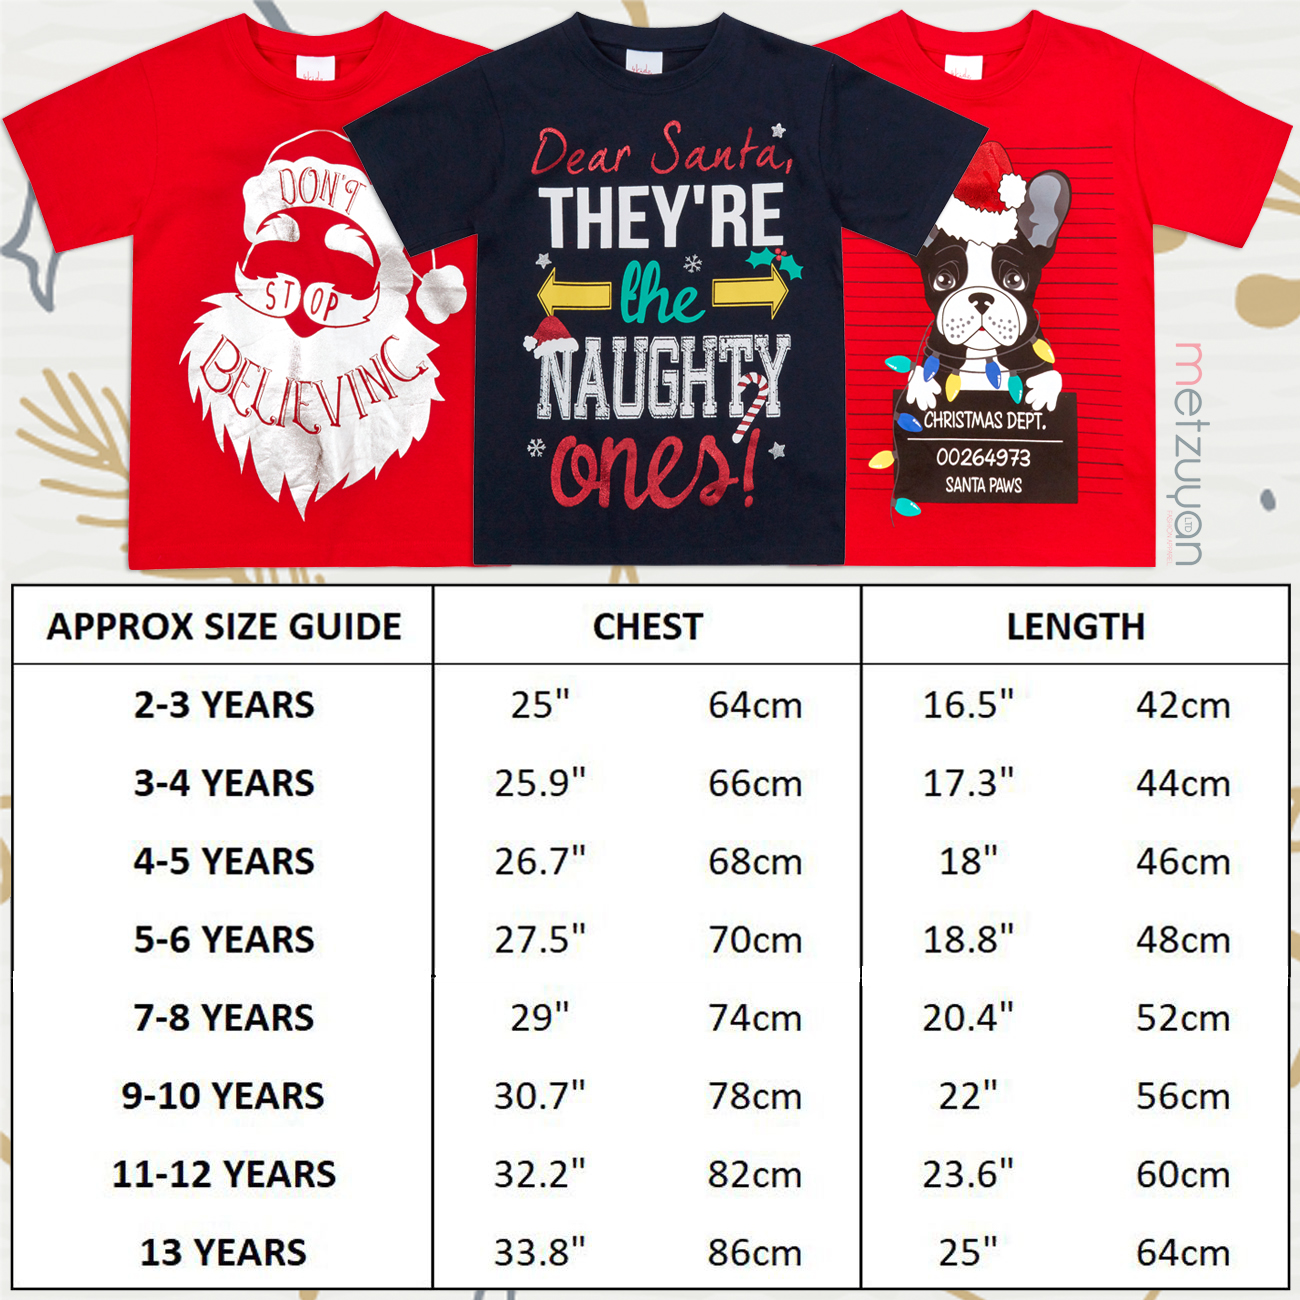 Childrens-Girls-Boys-Xmas-T-Shirts-Printed-Christmas-Design-100-Cotton-2-13-Yrs thumbnail 8